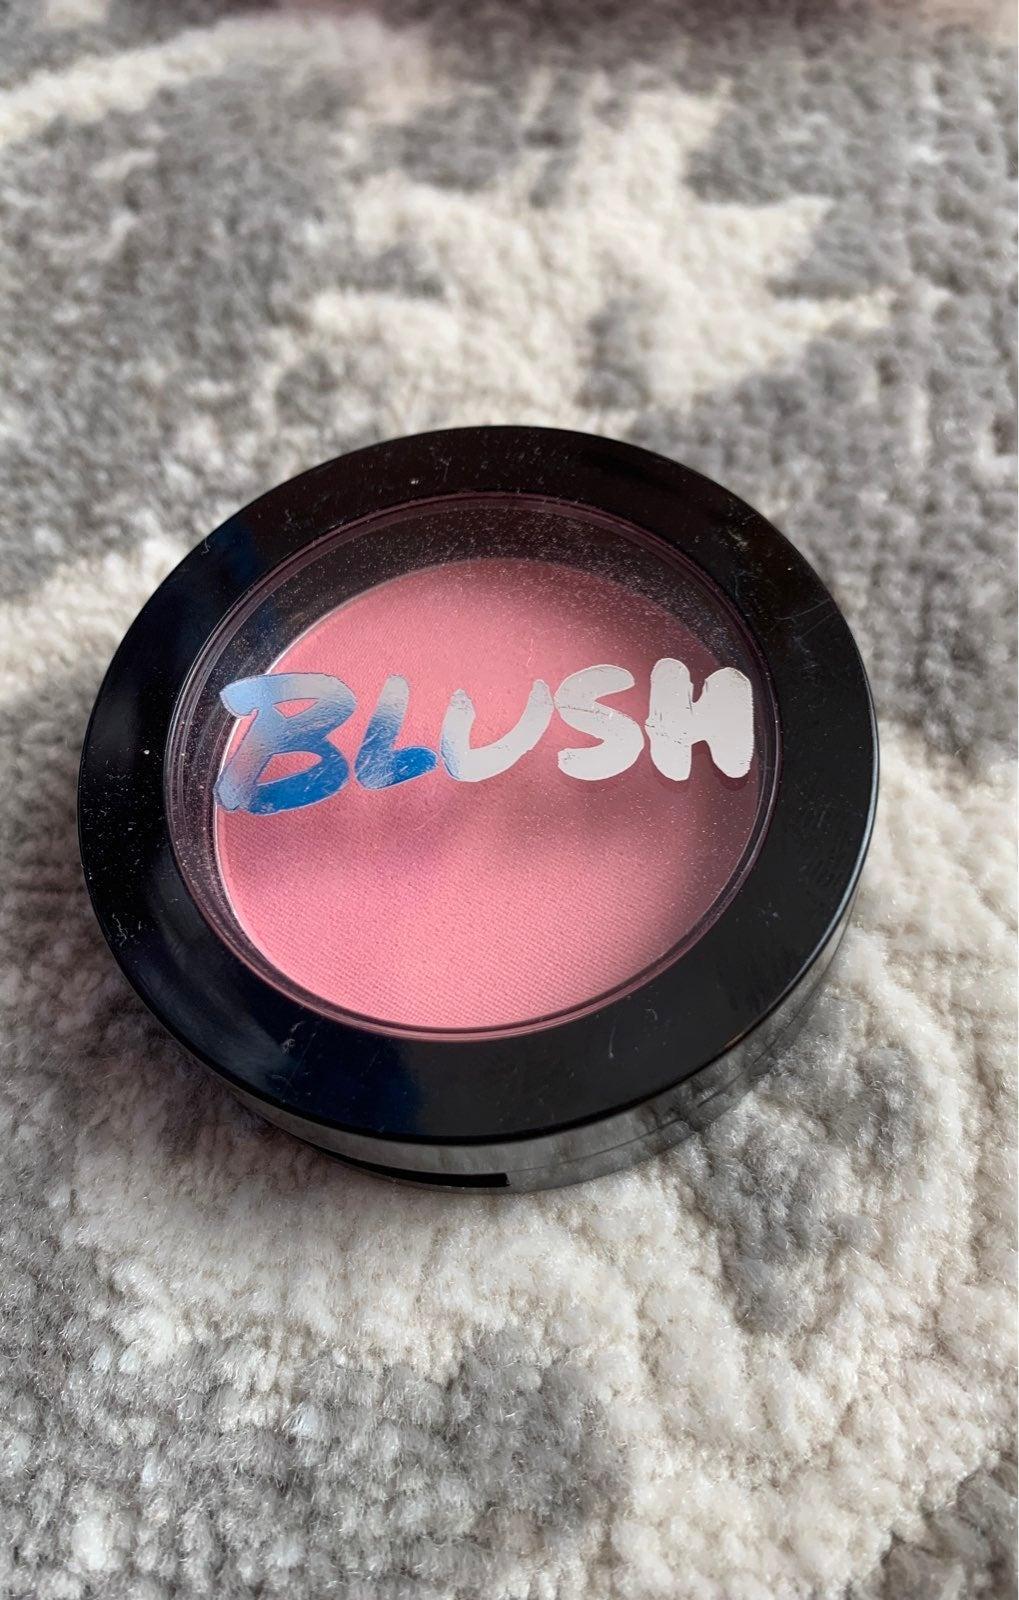 Model co peach bellini blush